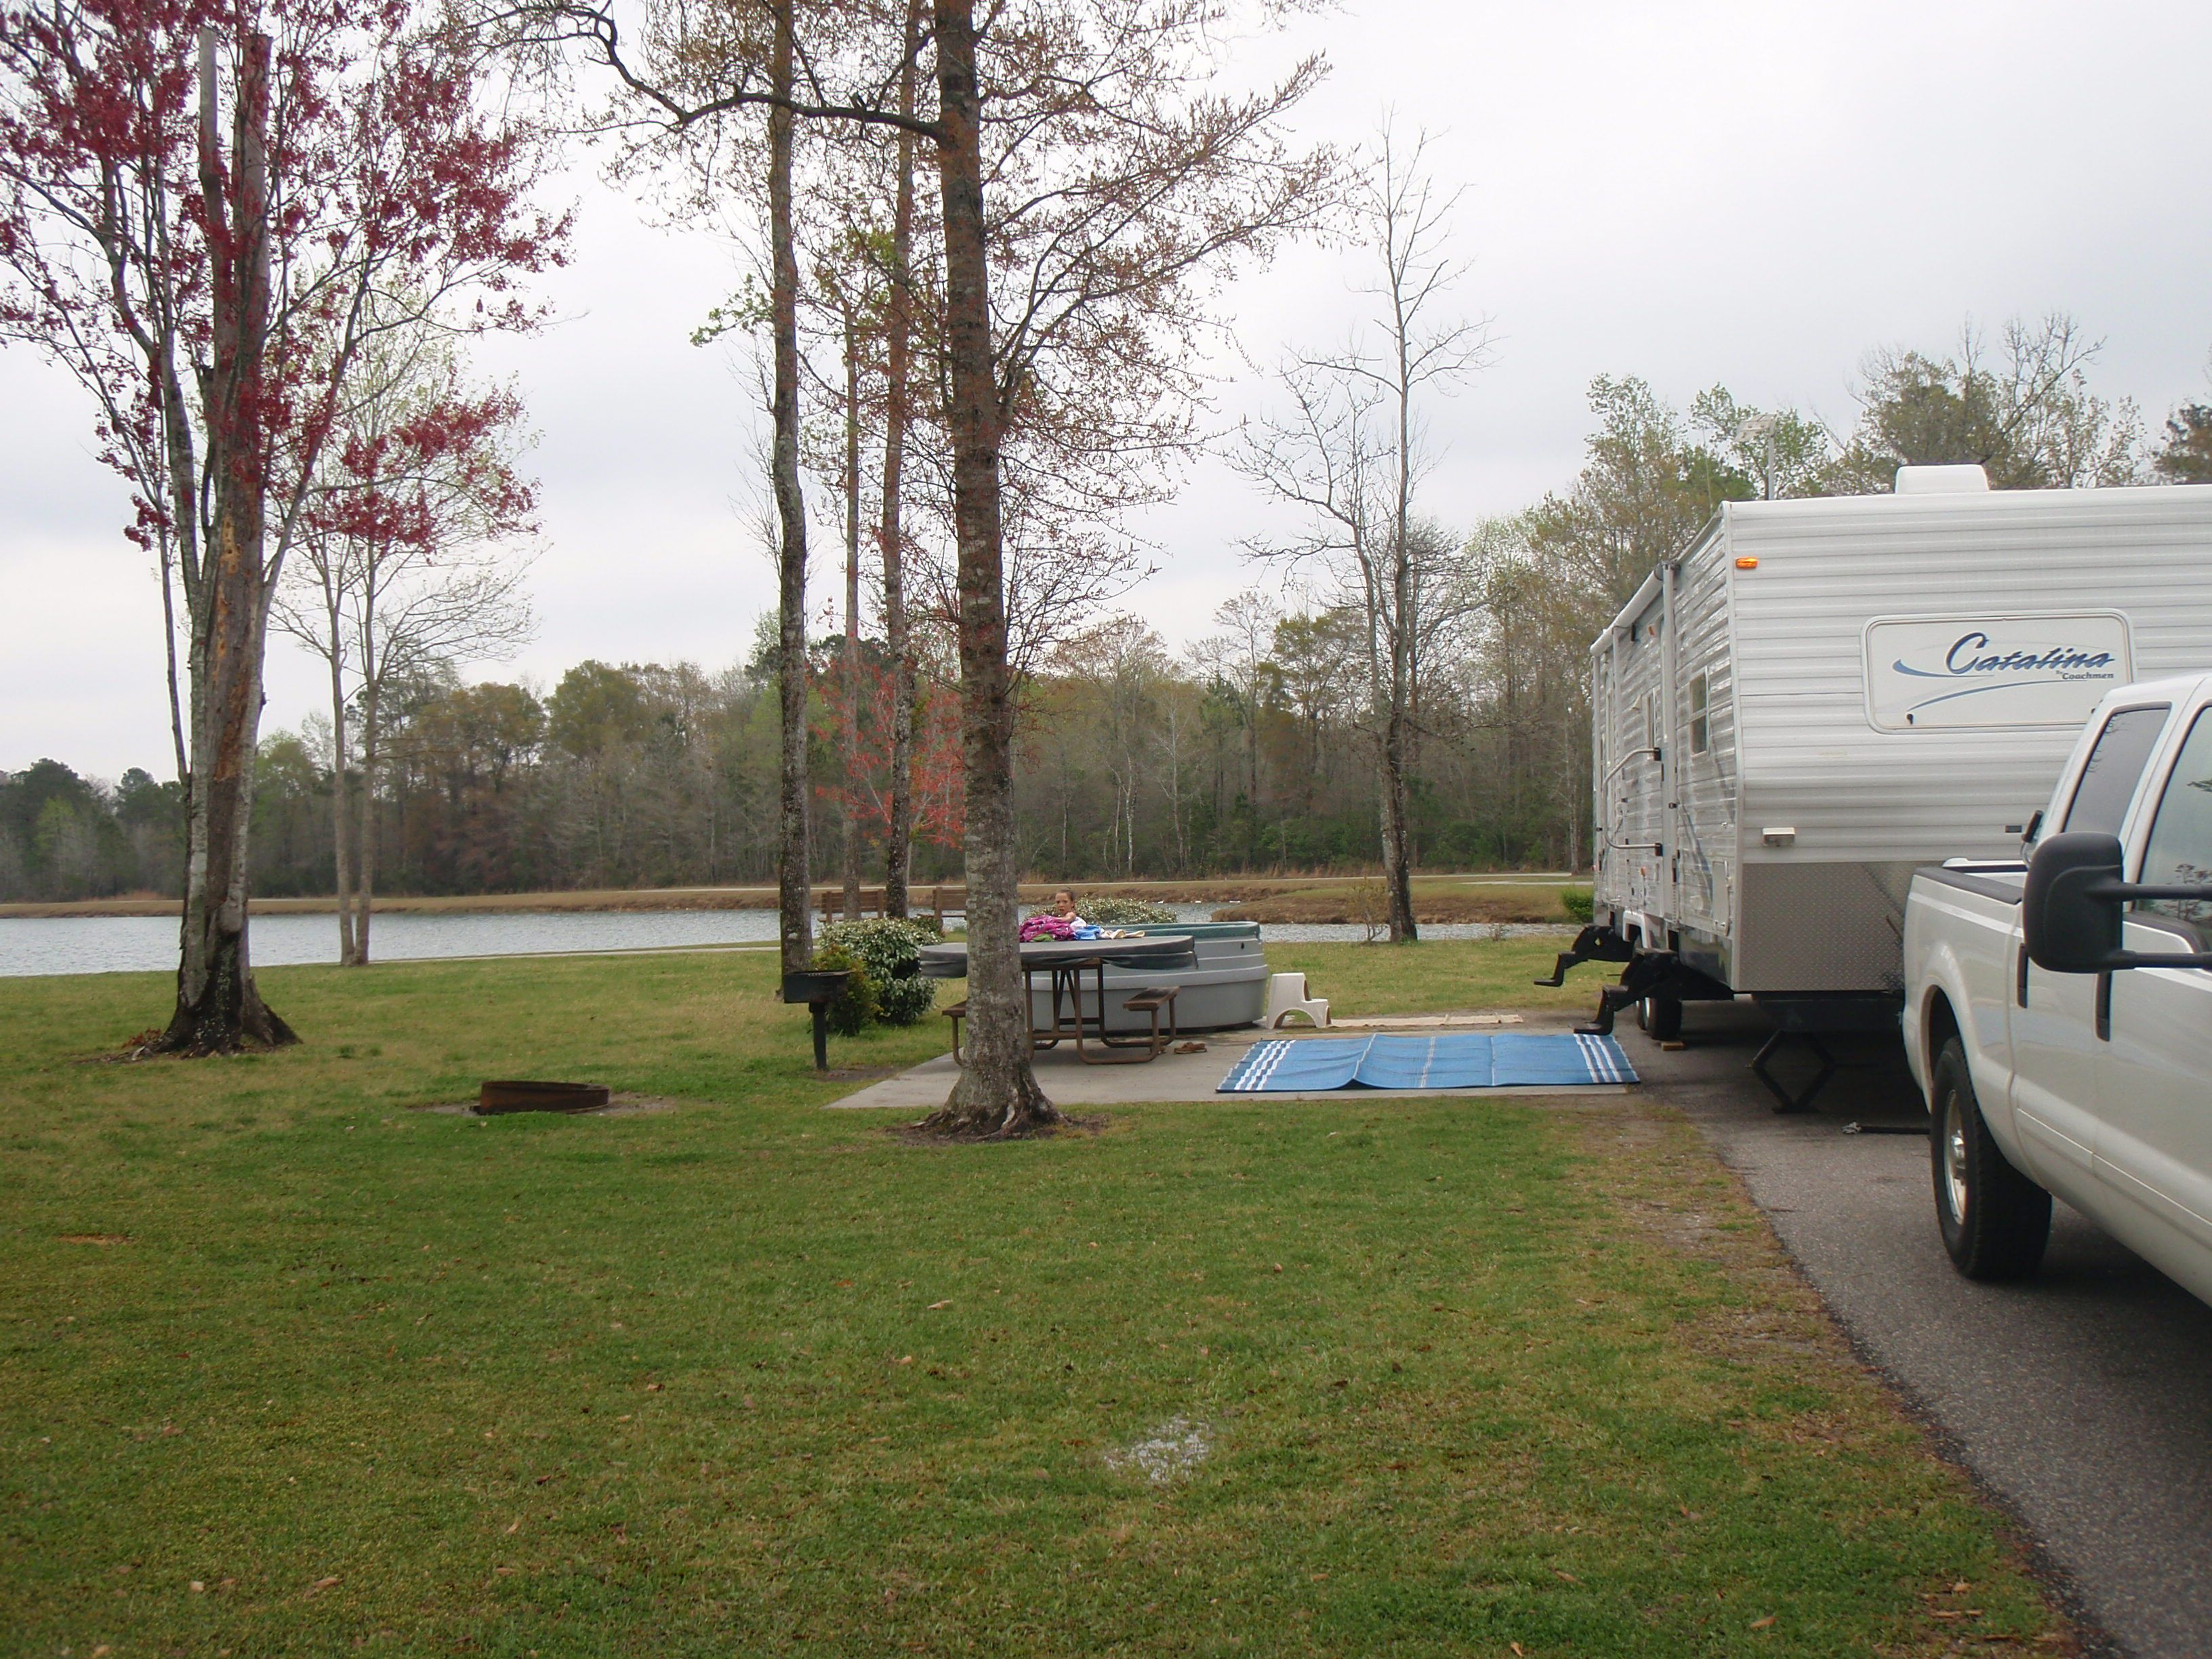 Willow Tree RV Resort in Longs, SC (near Cherry Grove